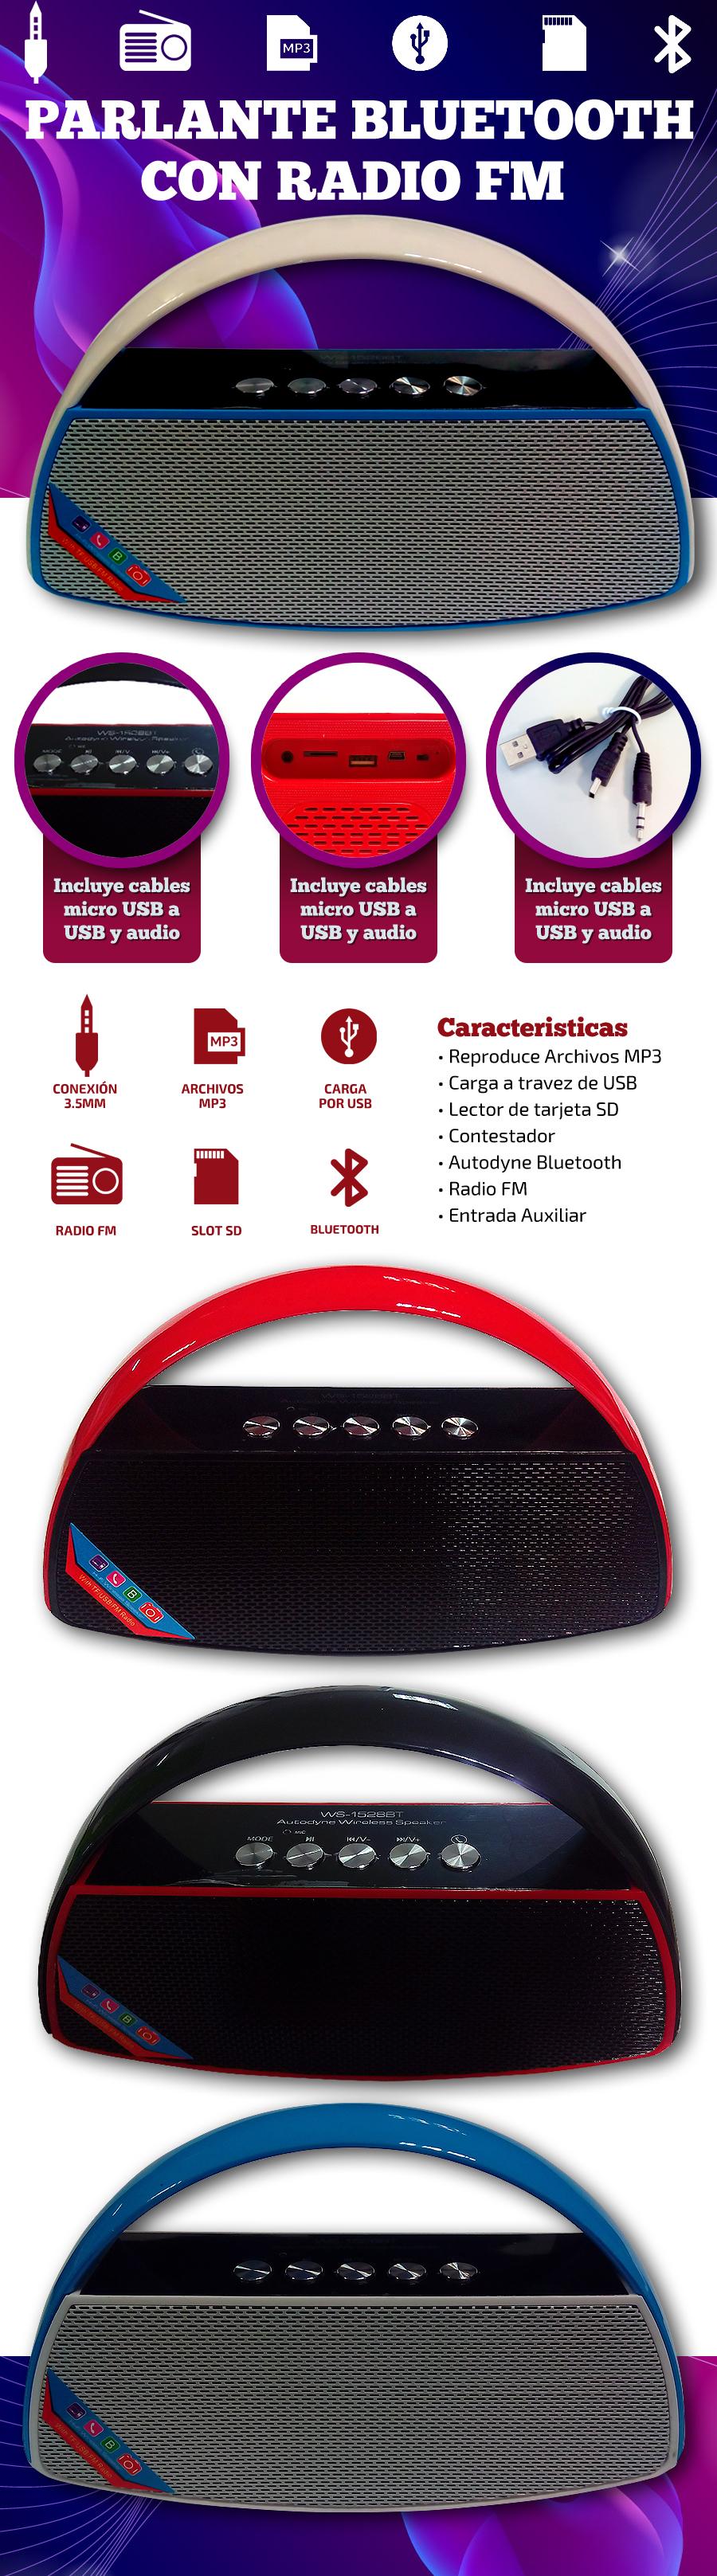 Parlante Bluetooth WS-1528|Radio FM /Slot SD|